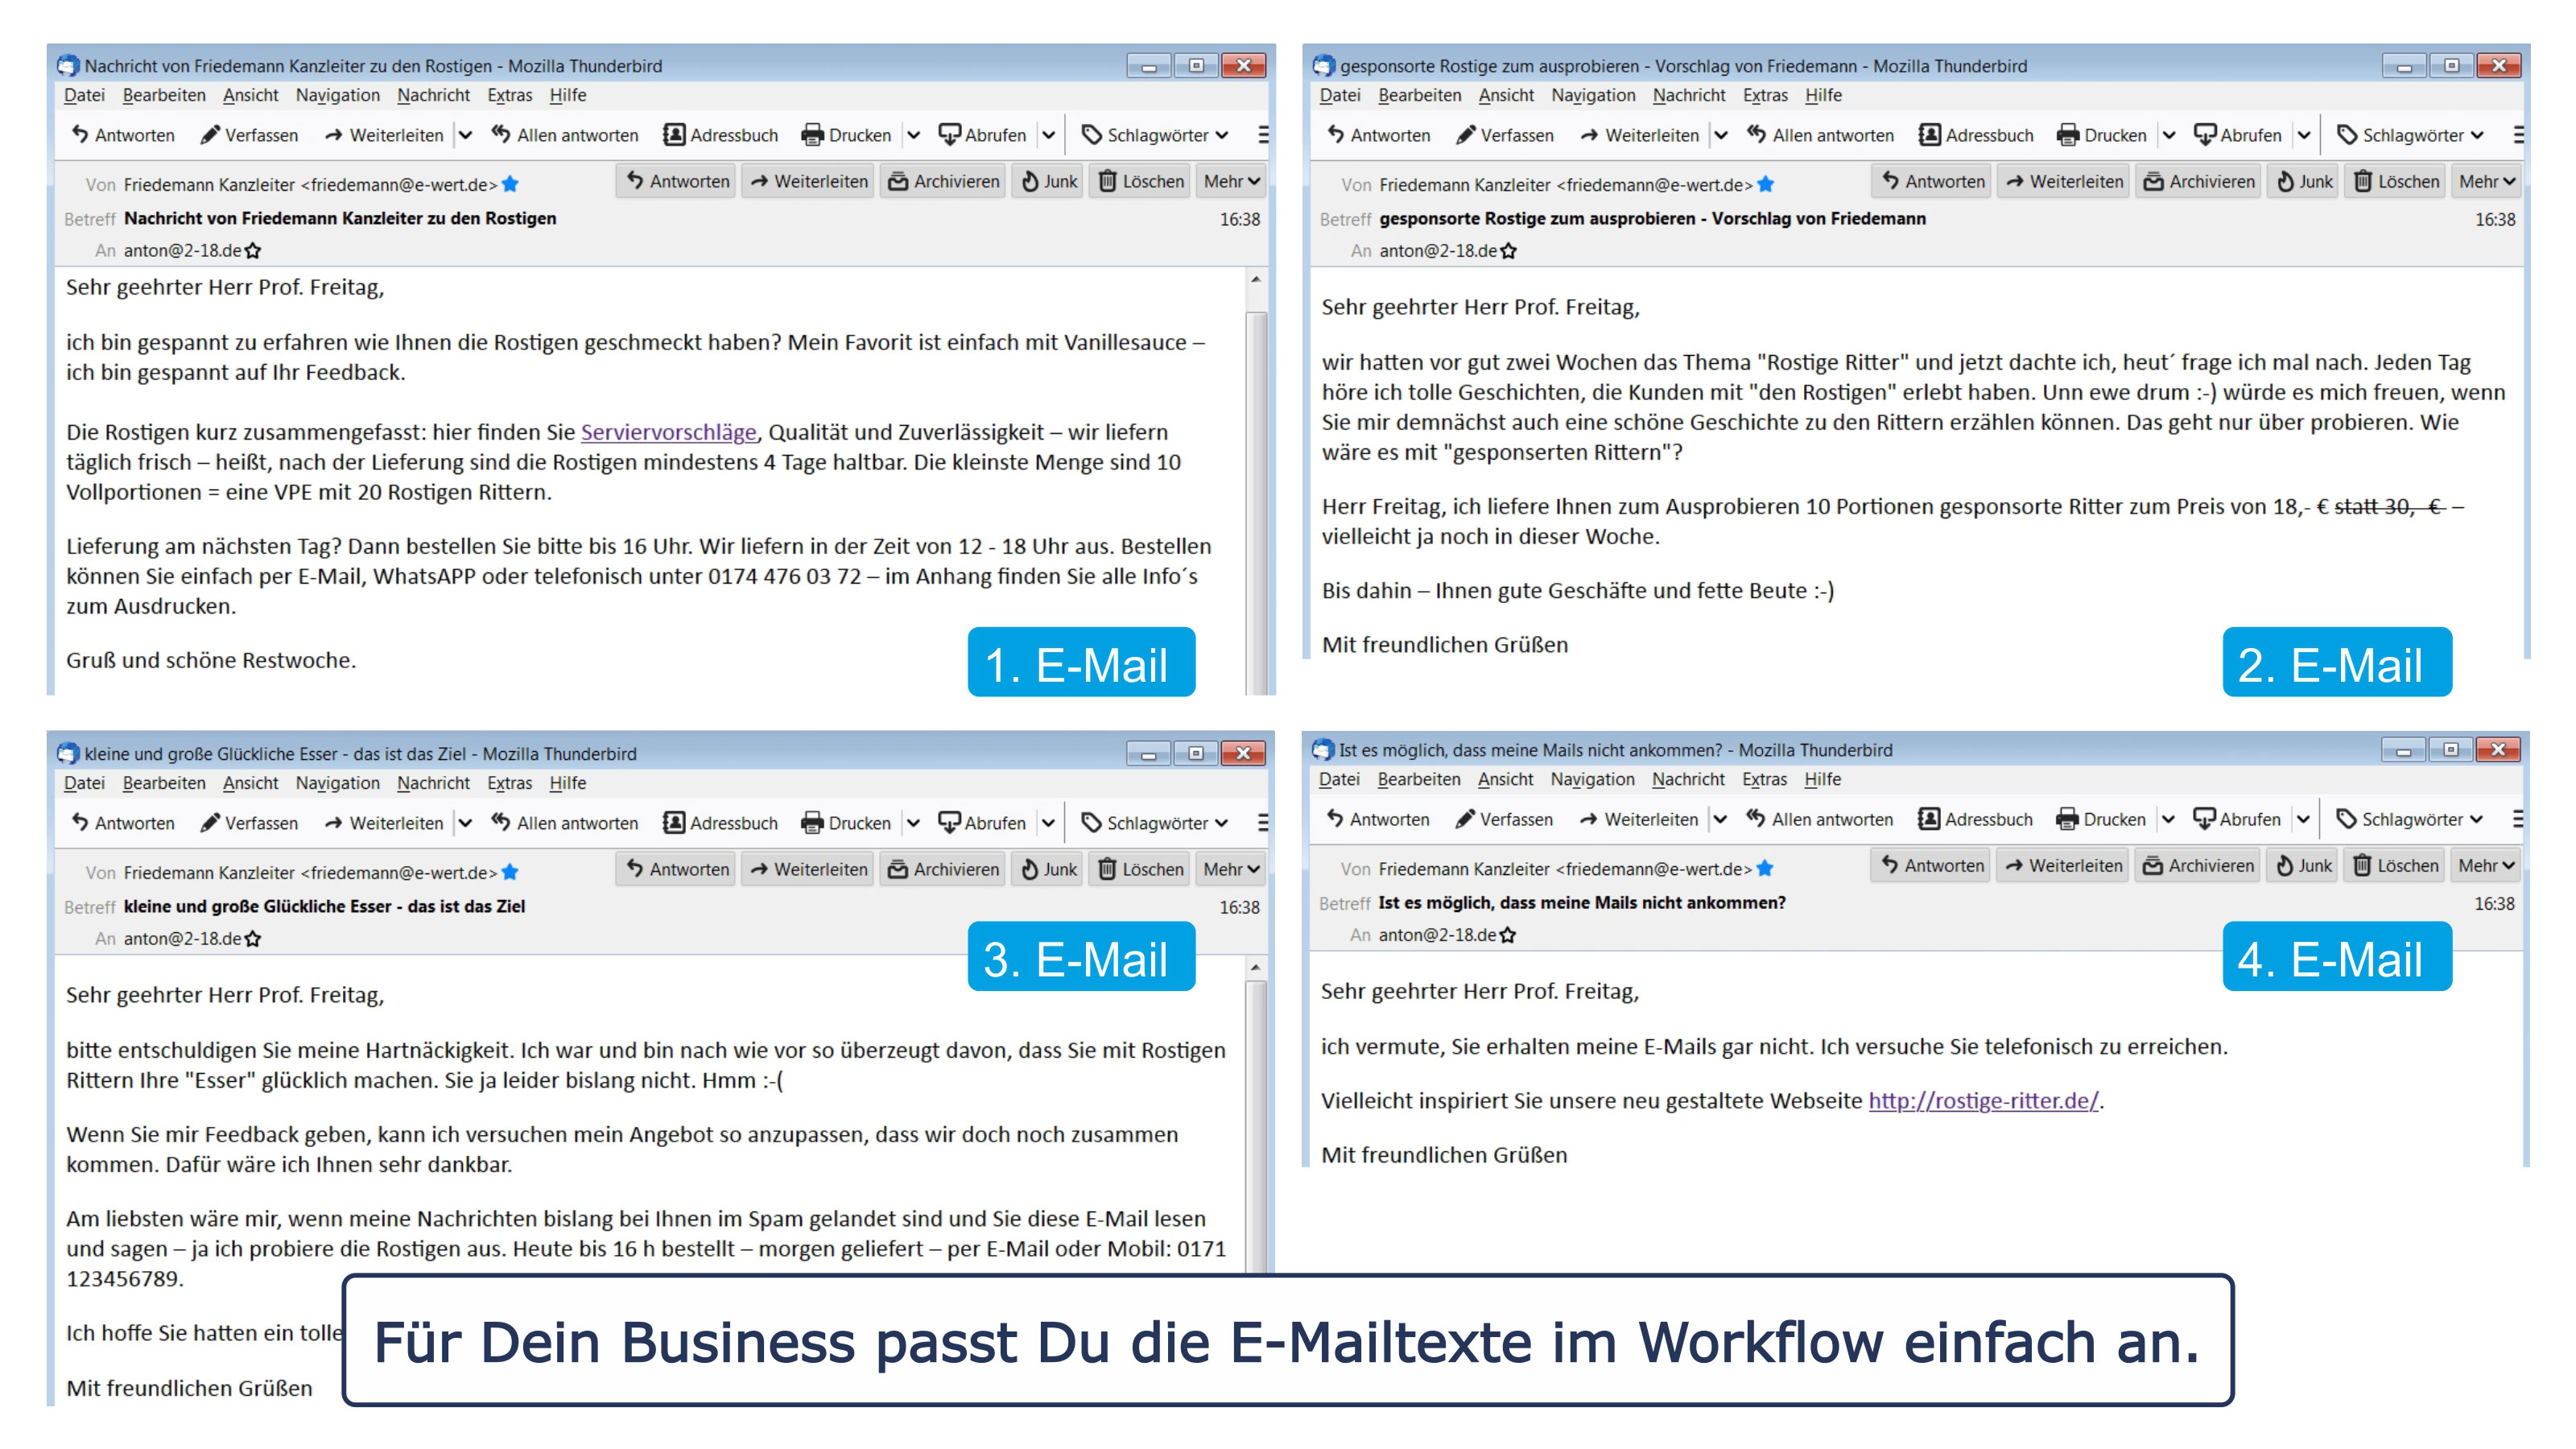 AK-Kampagne E-Mails